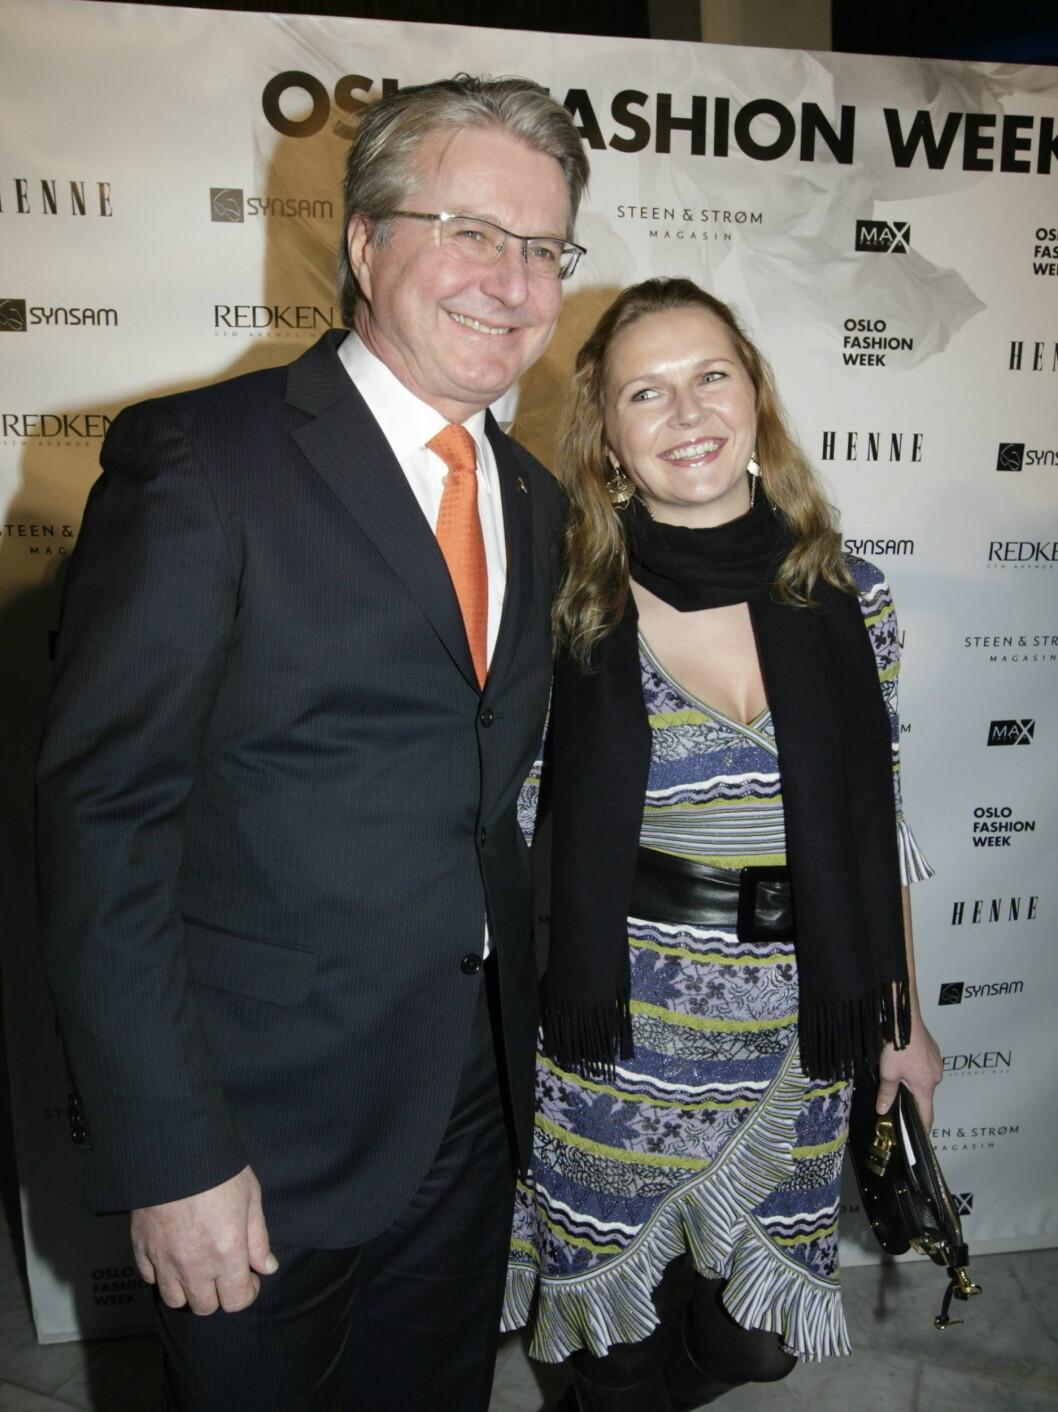 MOTELØVE: Oslos ordfører Fabian Stang kom sammen med kjæresten Catharina Munthe. Foto: SCANPIX